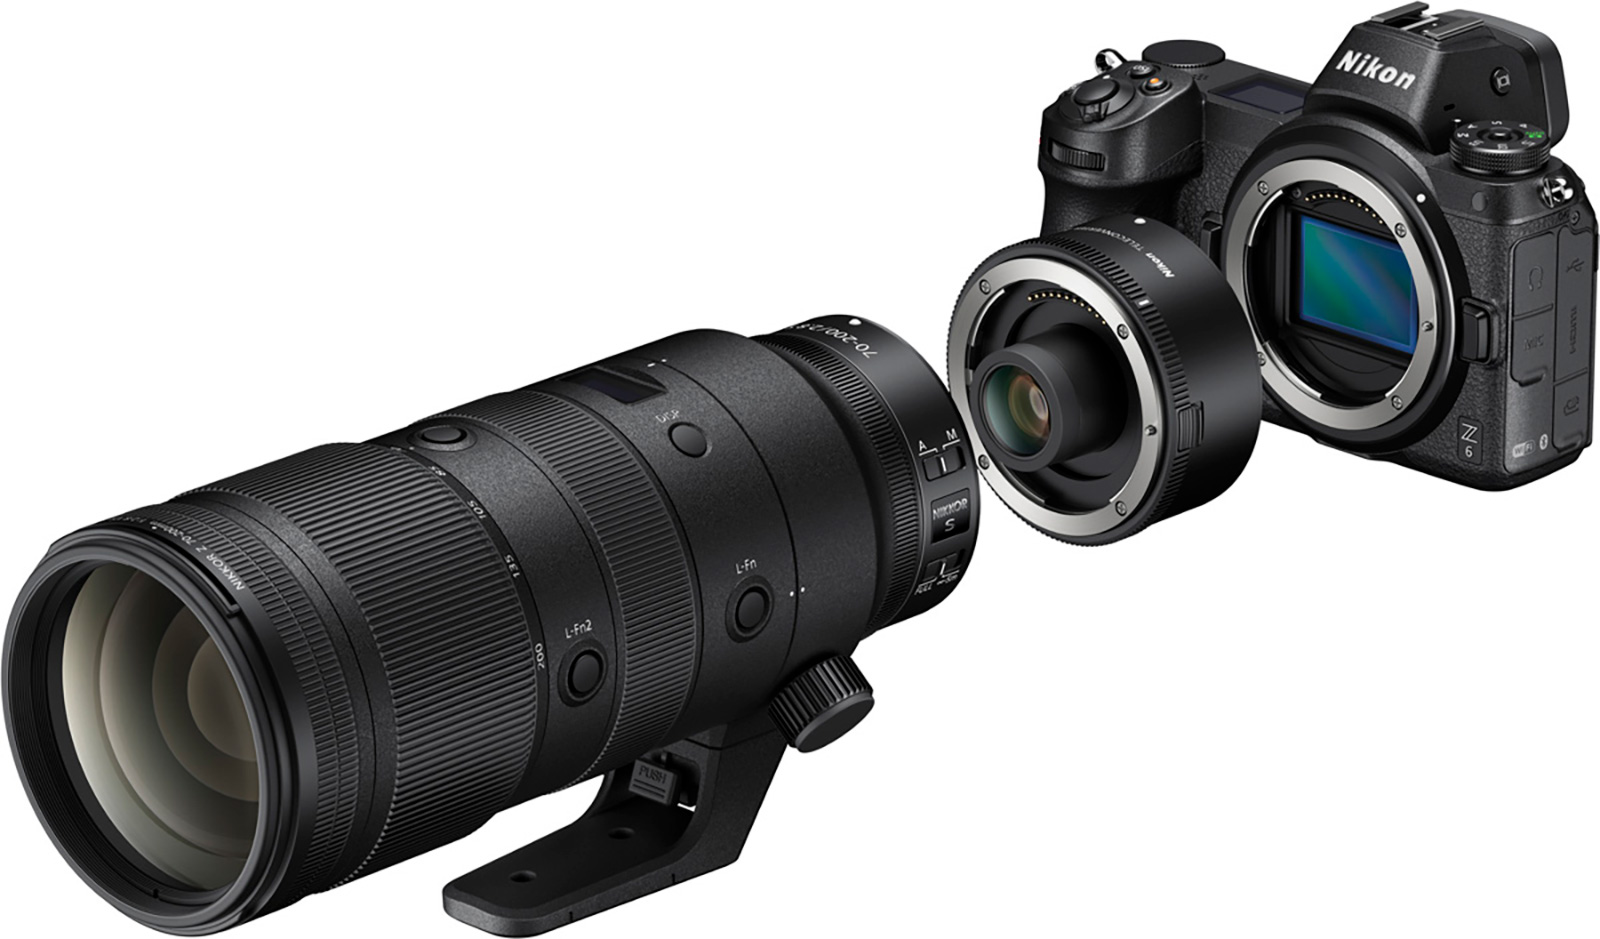 Nikon 70-200mm Z lens with TC